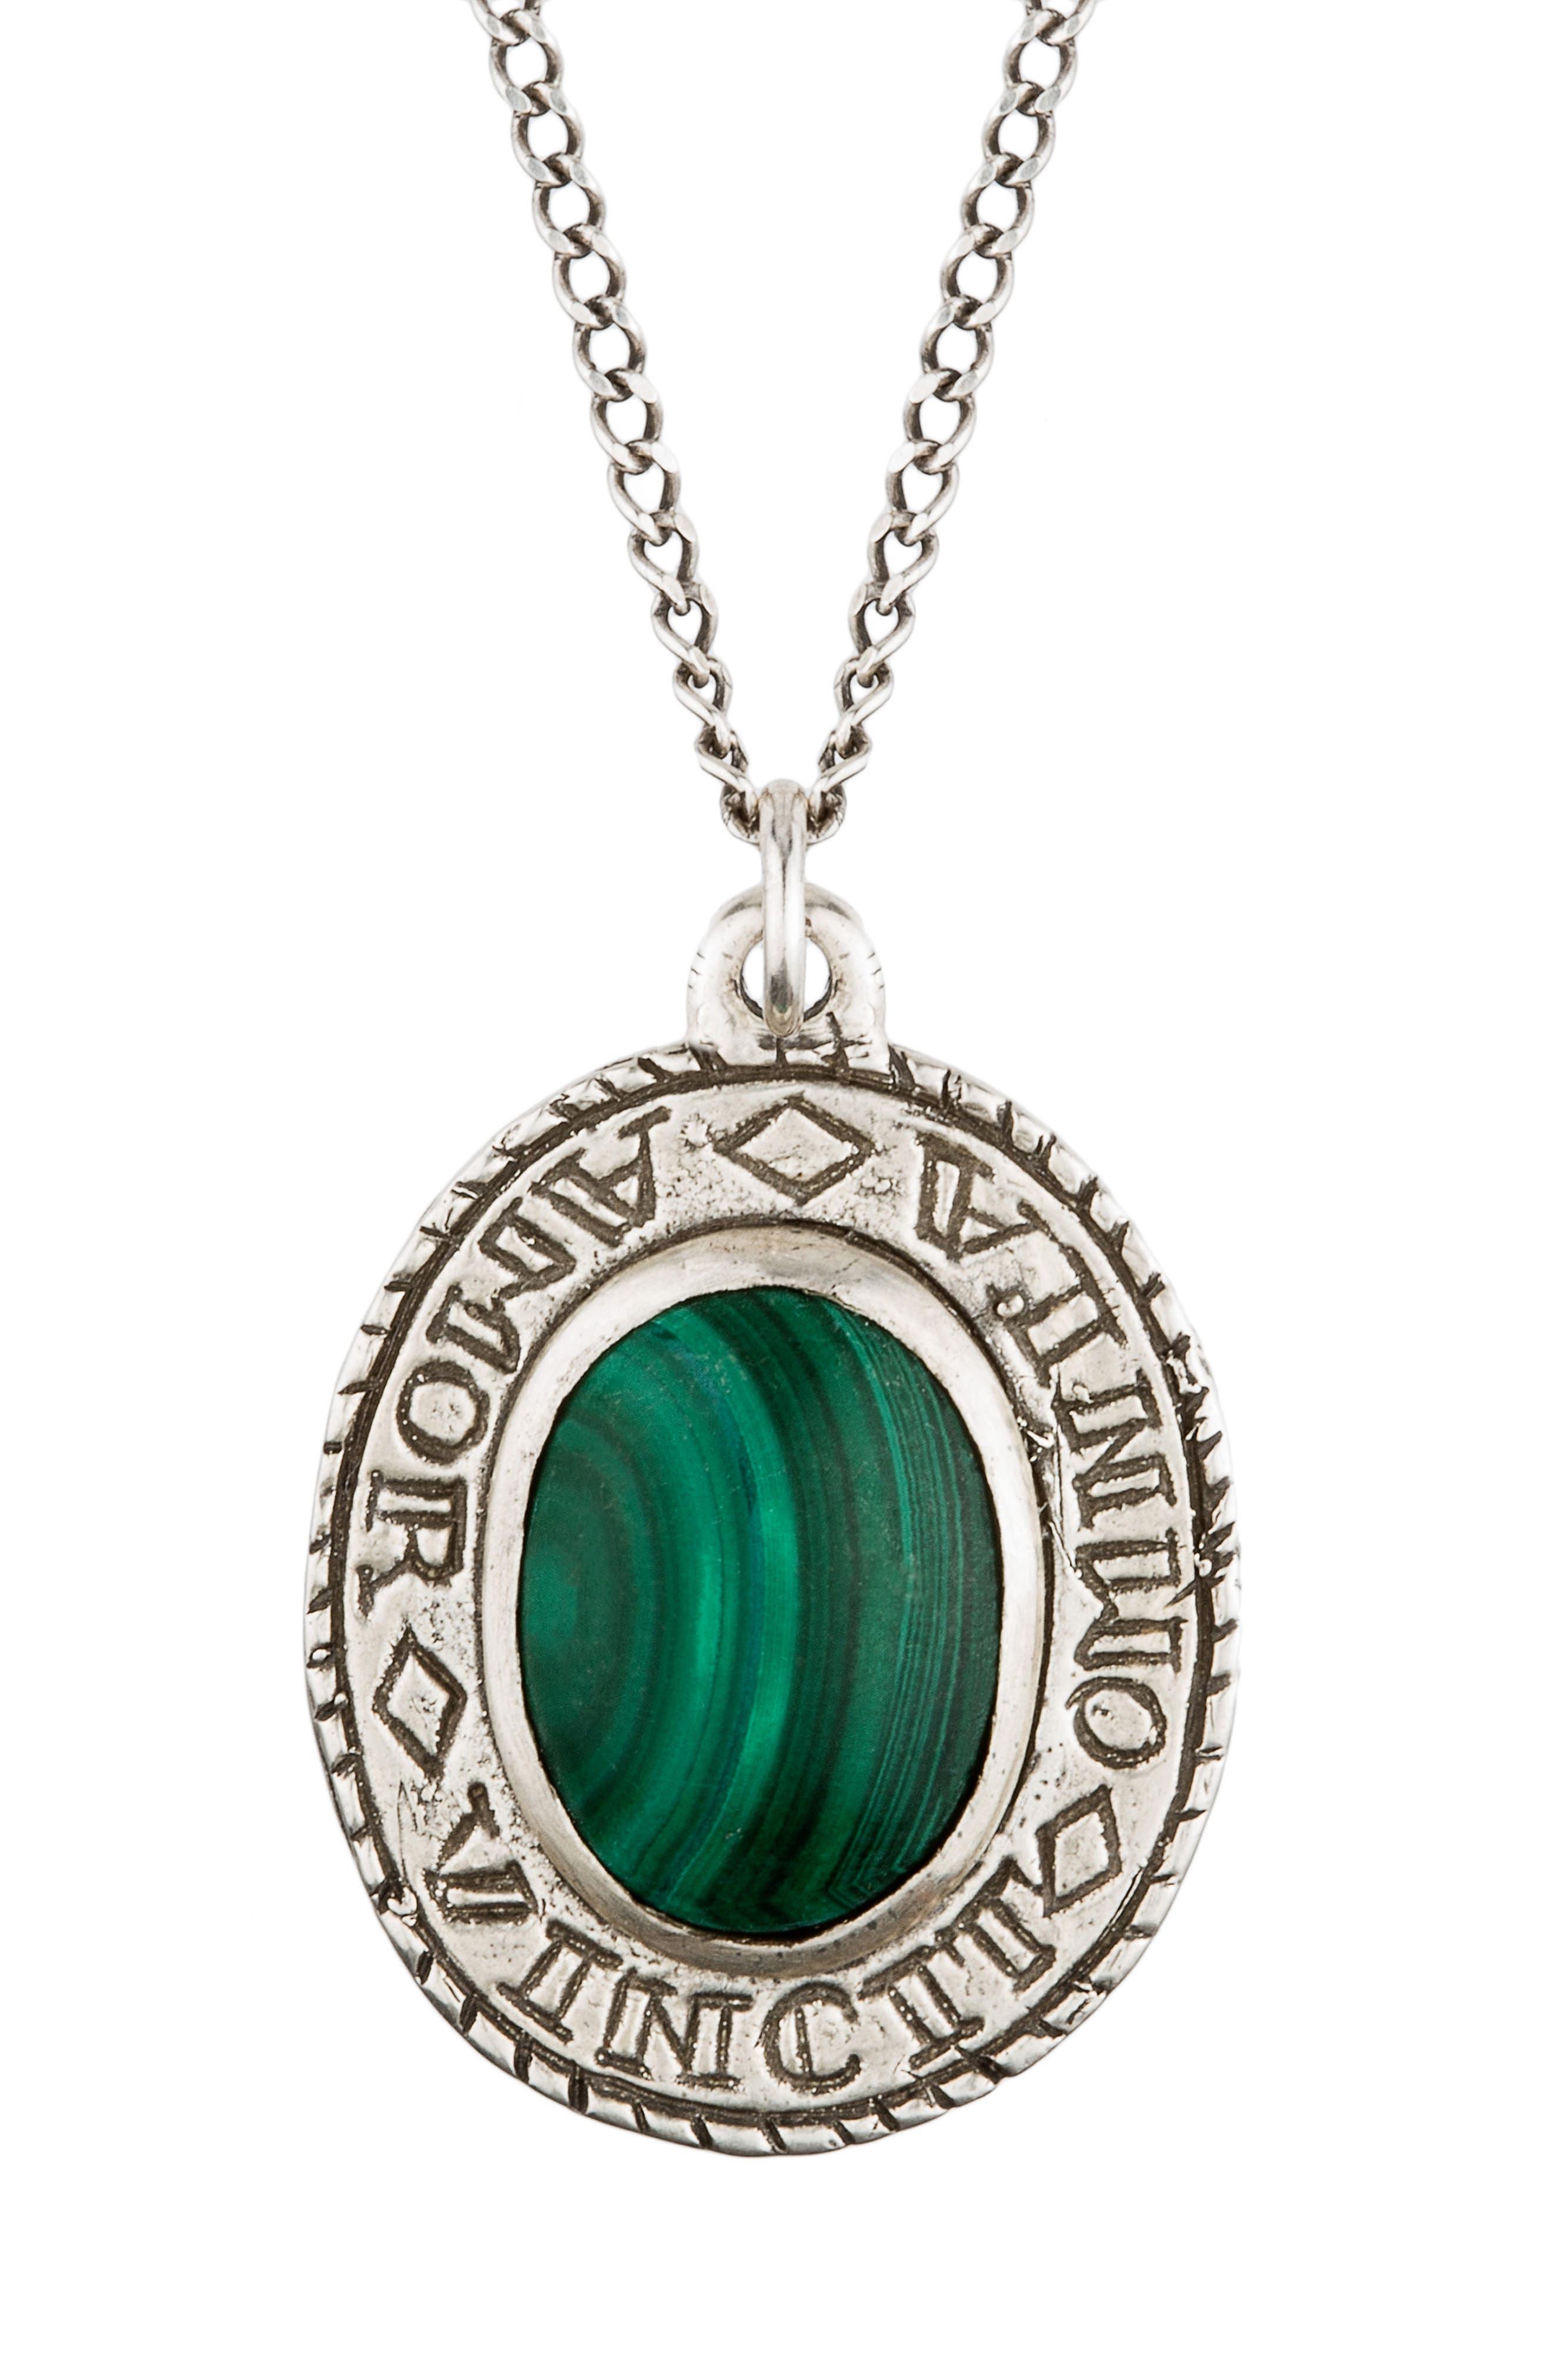 Alternate Image 1 Selected - Lewis Henry Nicholas Amor Sterling Silver Pendant Necklace